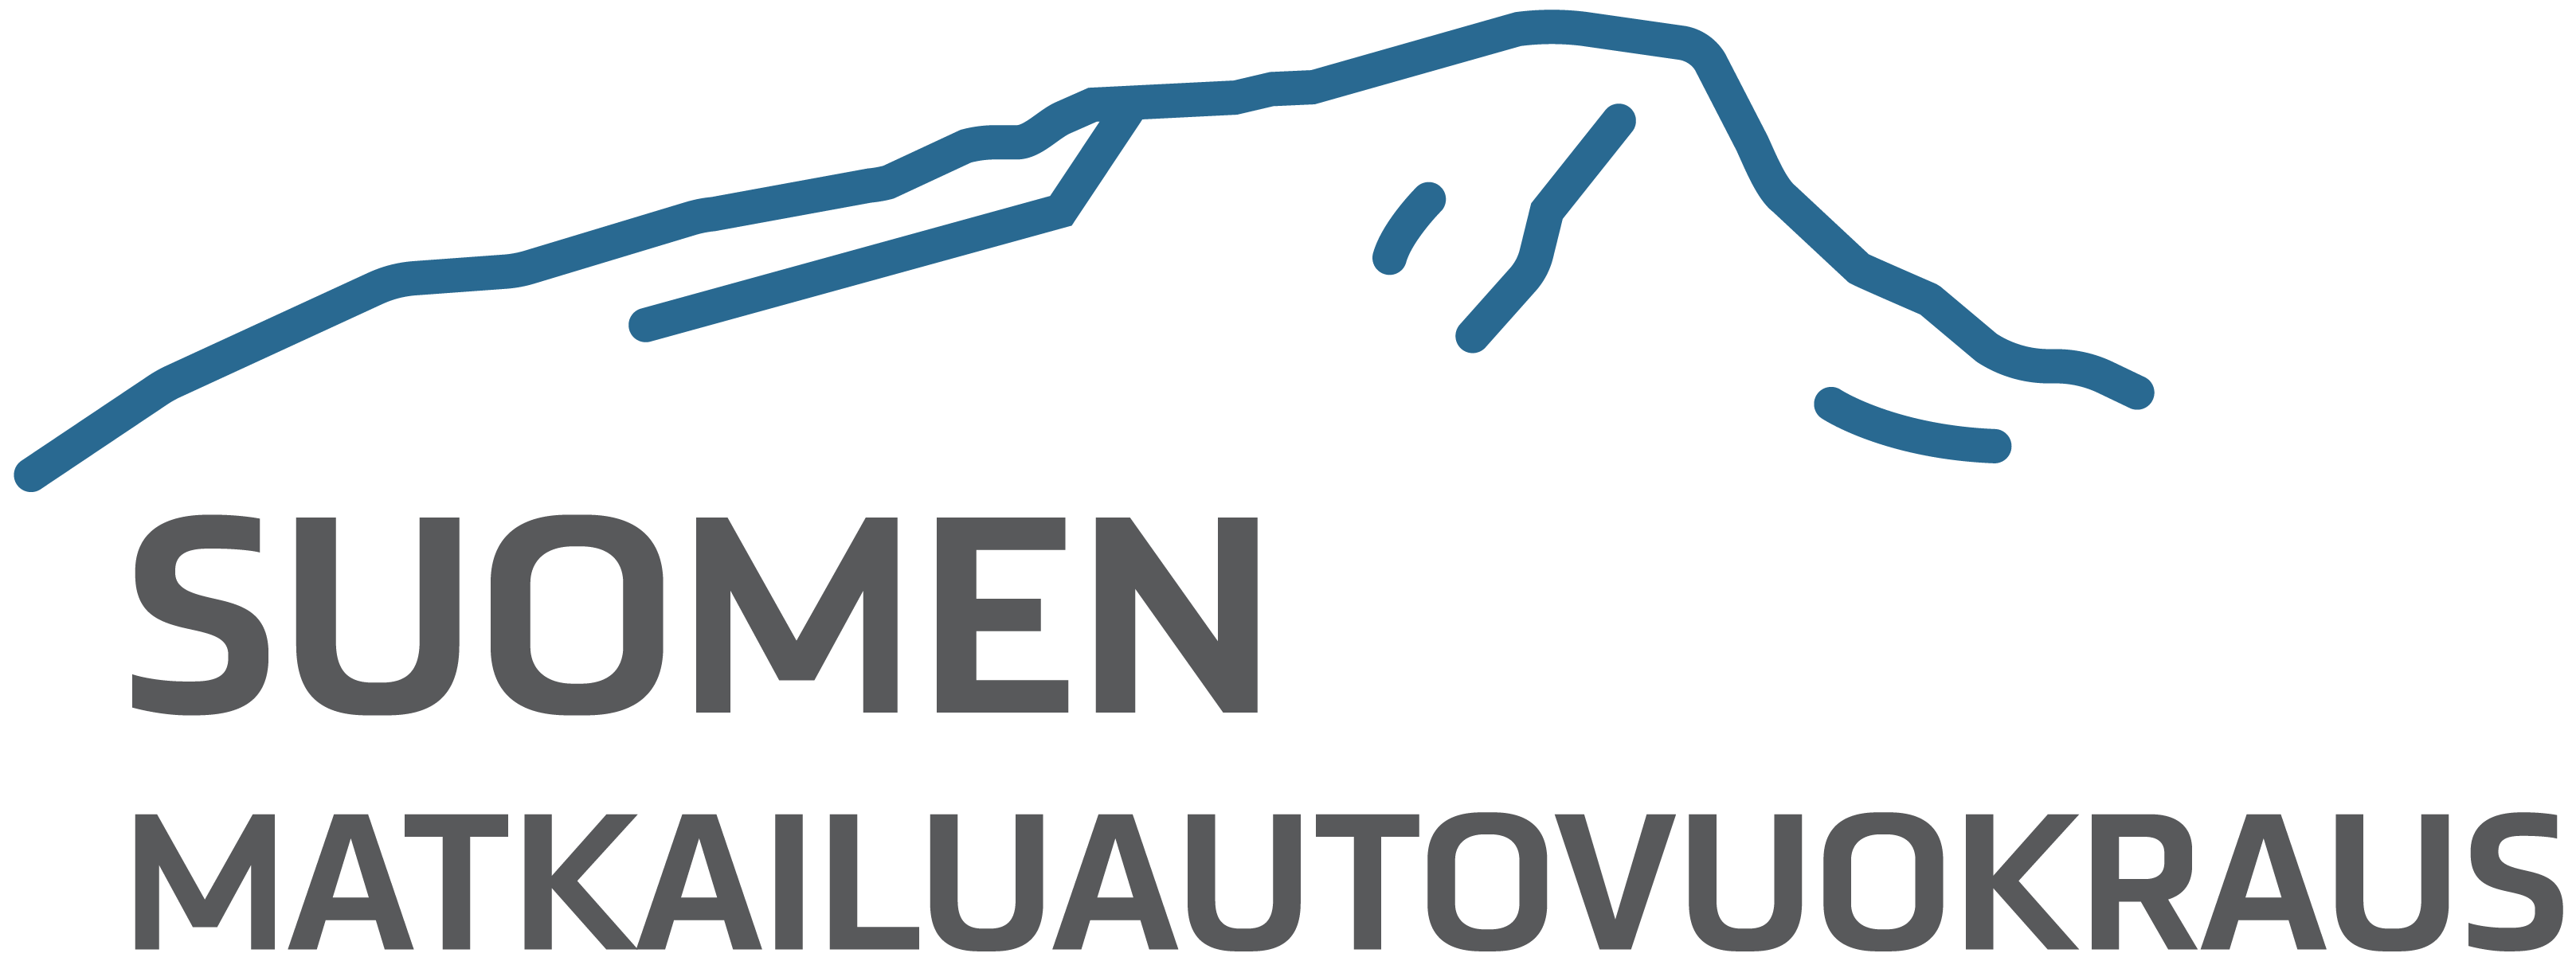 Suomen Matkailuautovuokraus - Motorhome Rental Finland